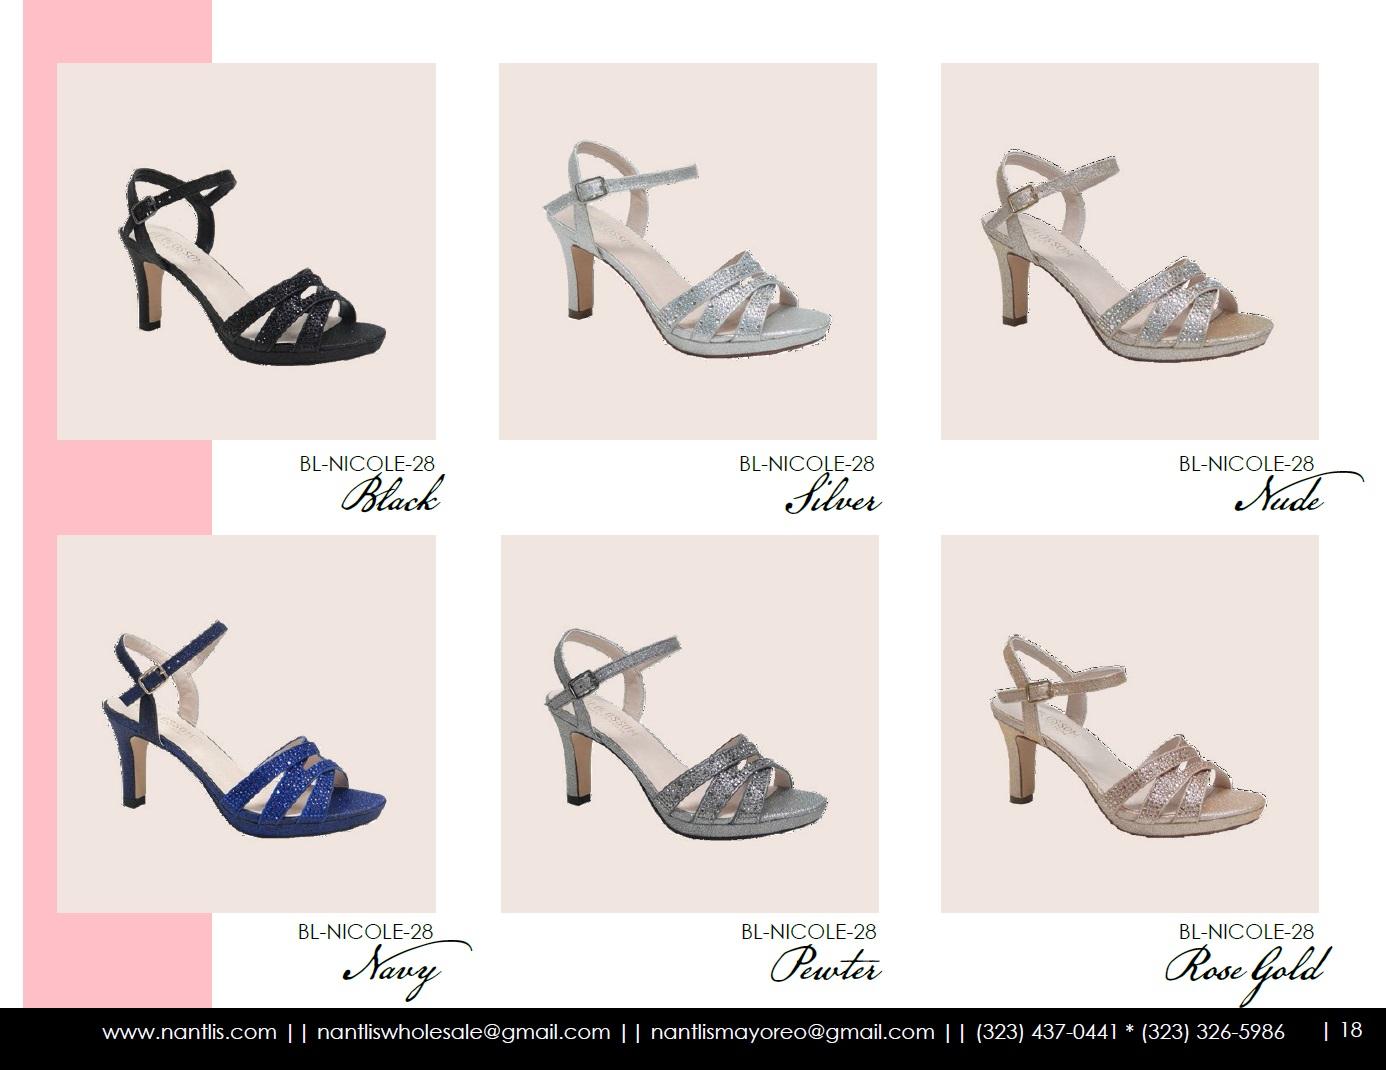 Nantlis Vol BL50 Zapatos de Mujer mayoreo Catalogo Wholesale womens Shoes_Page_18